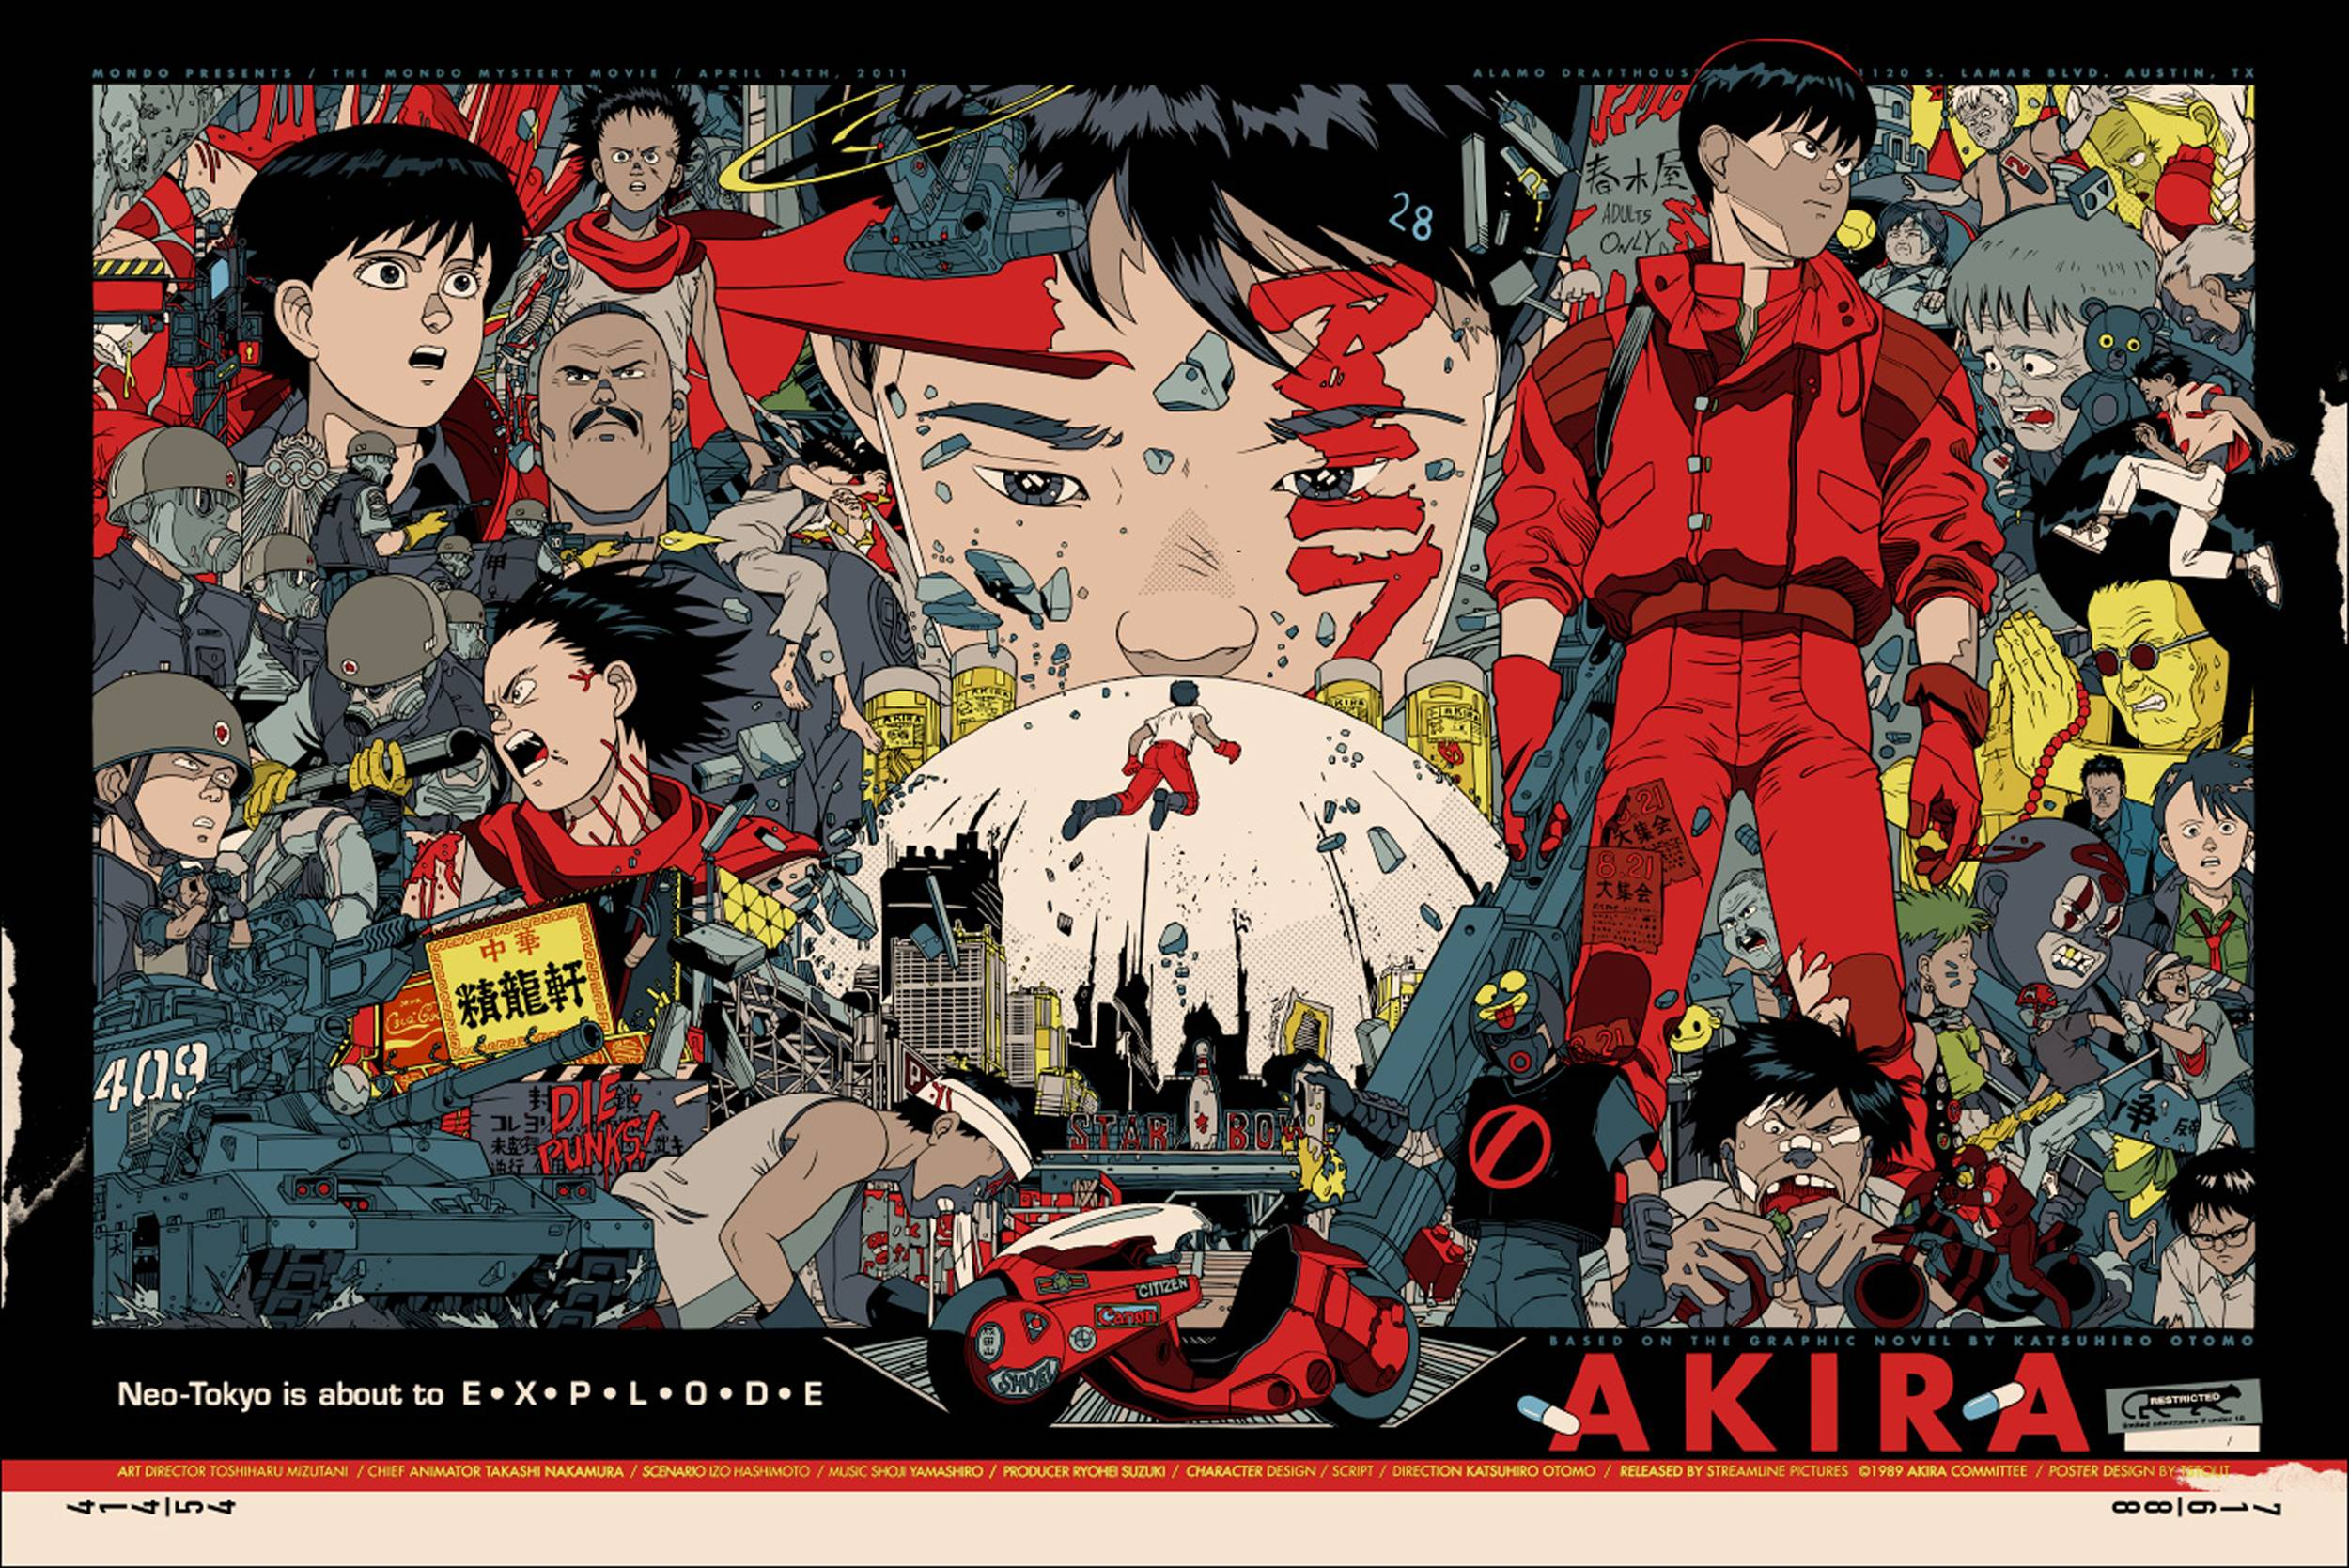 akira-film-mutant-ultime-des-annees-80